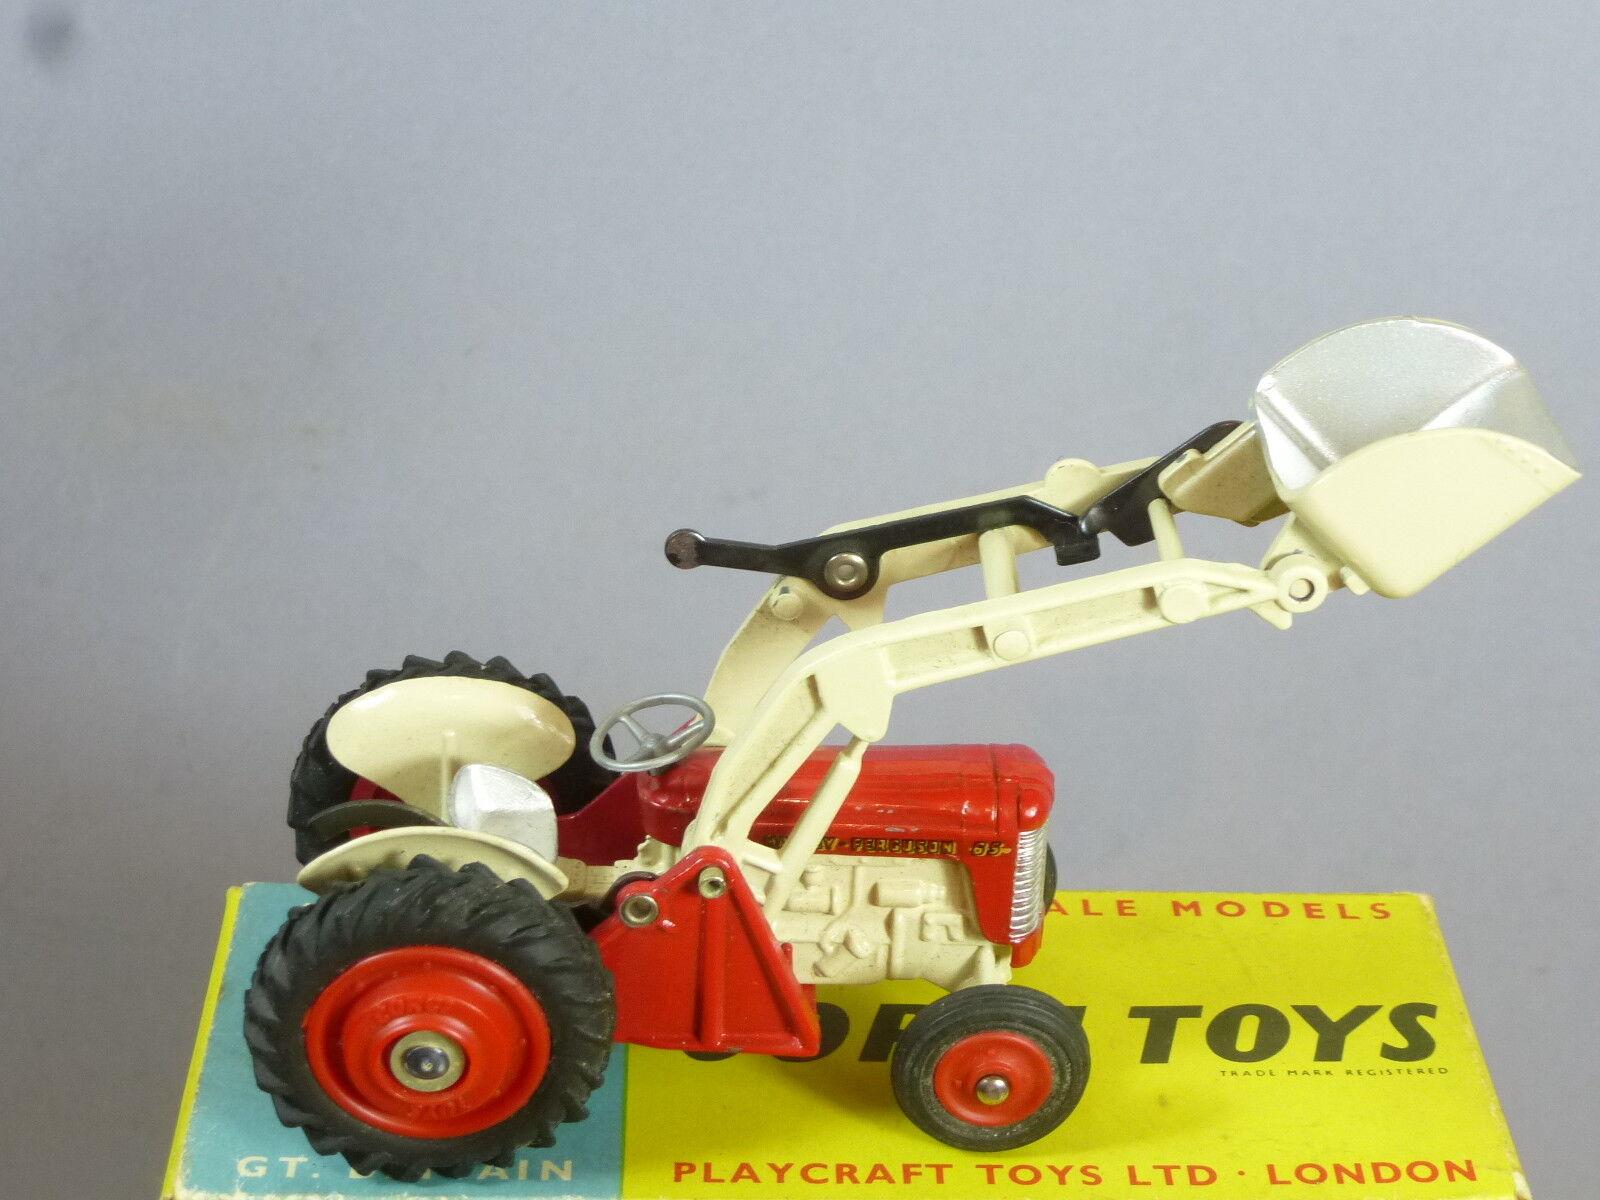 CORGI CORGI CORGI TOYS MODEL No.53 Massey-Ferguson 65 Tracteur avec pelle VN En parfait état, dans sa boîte 6ca866